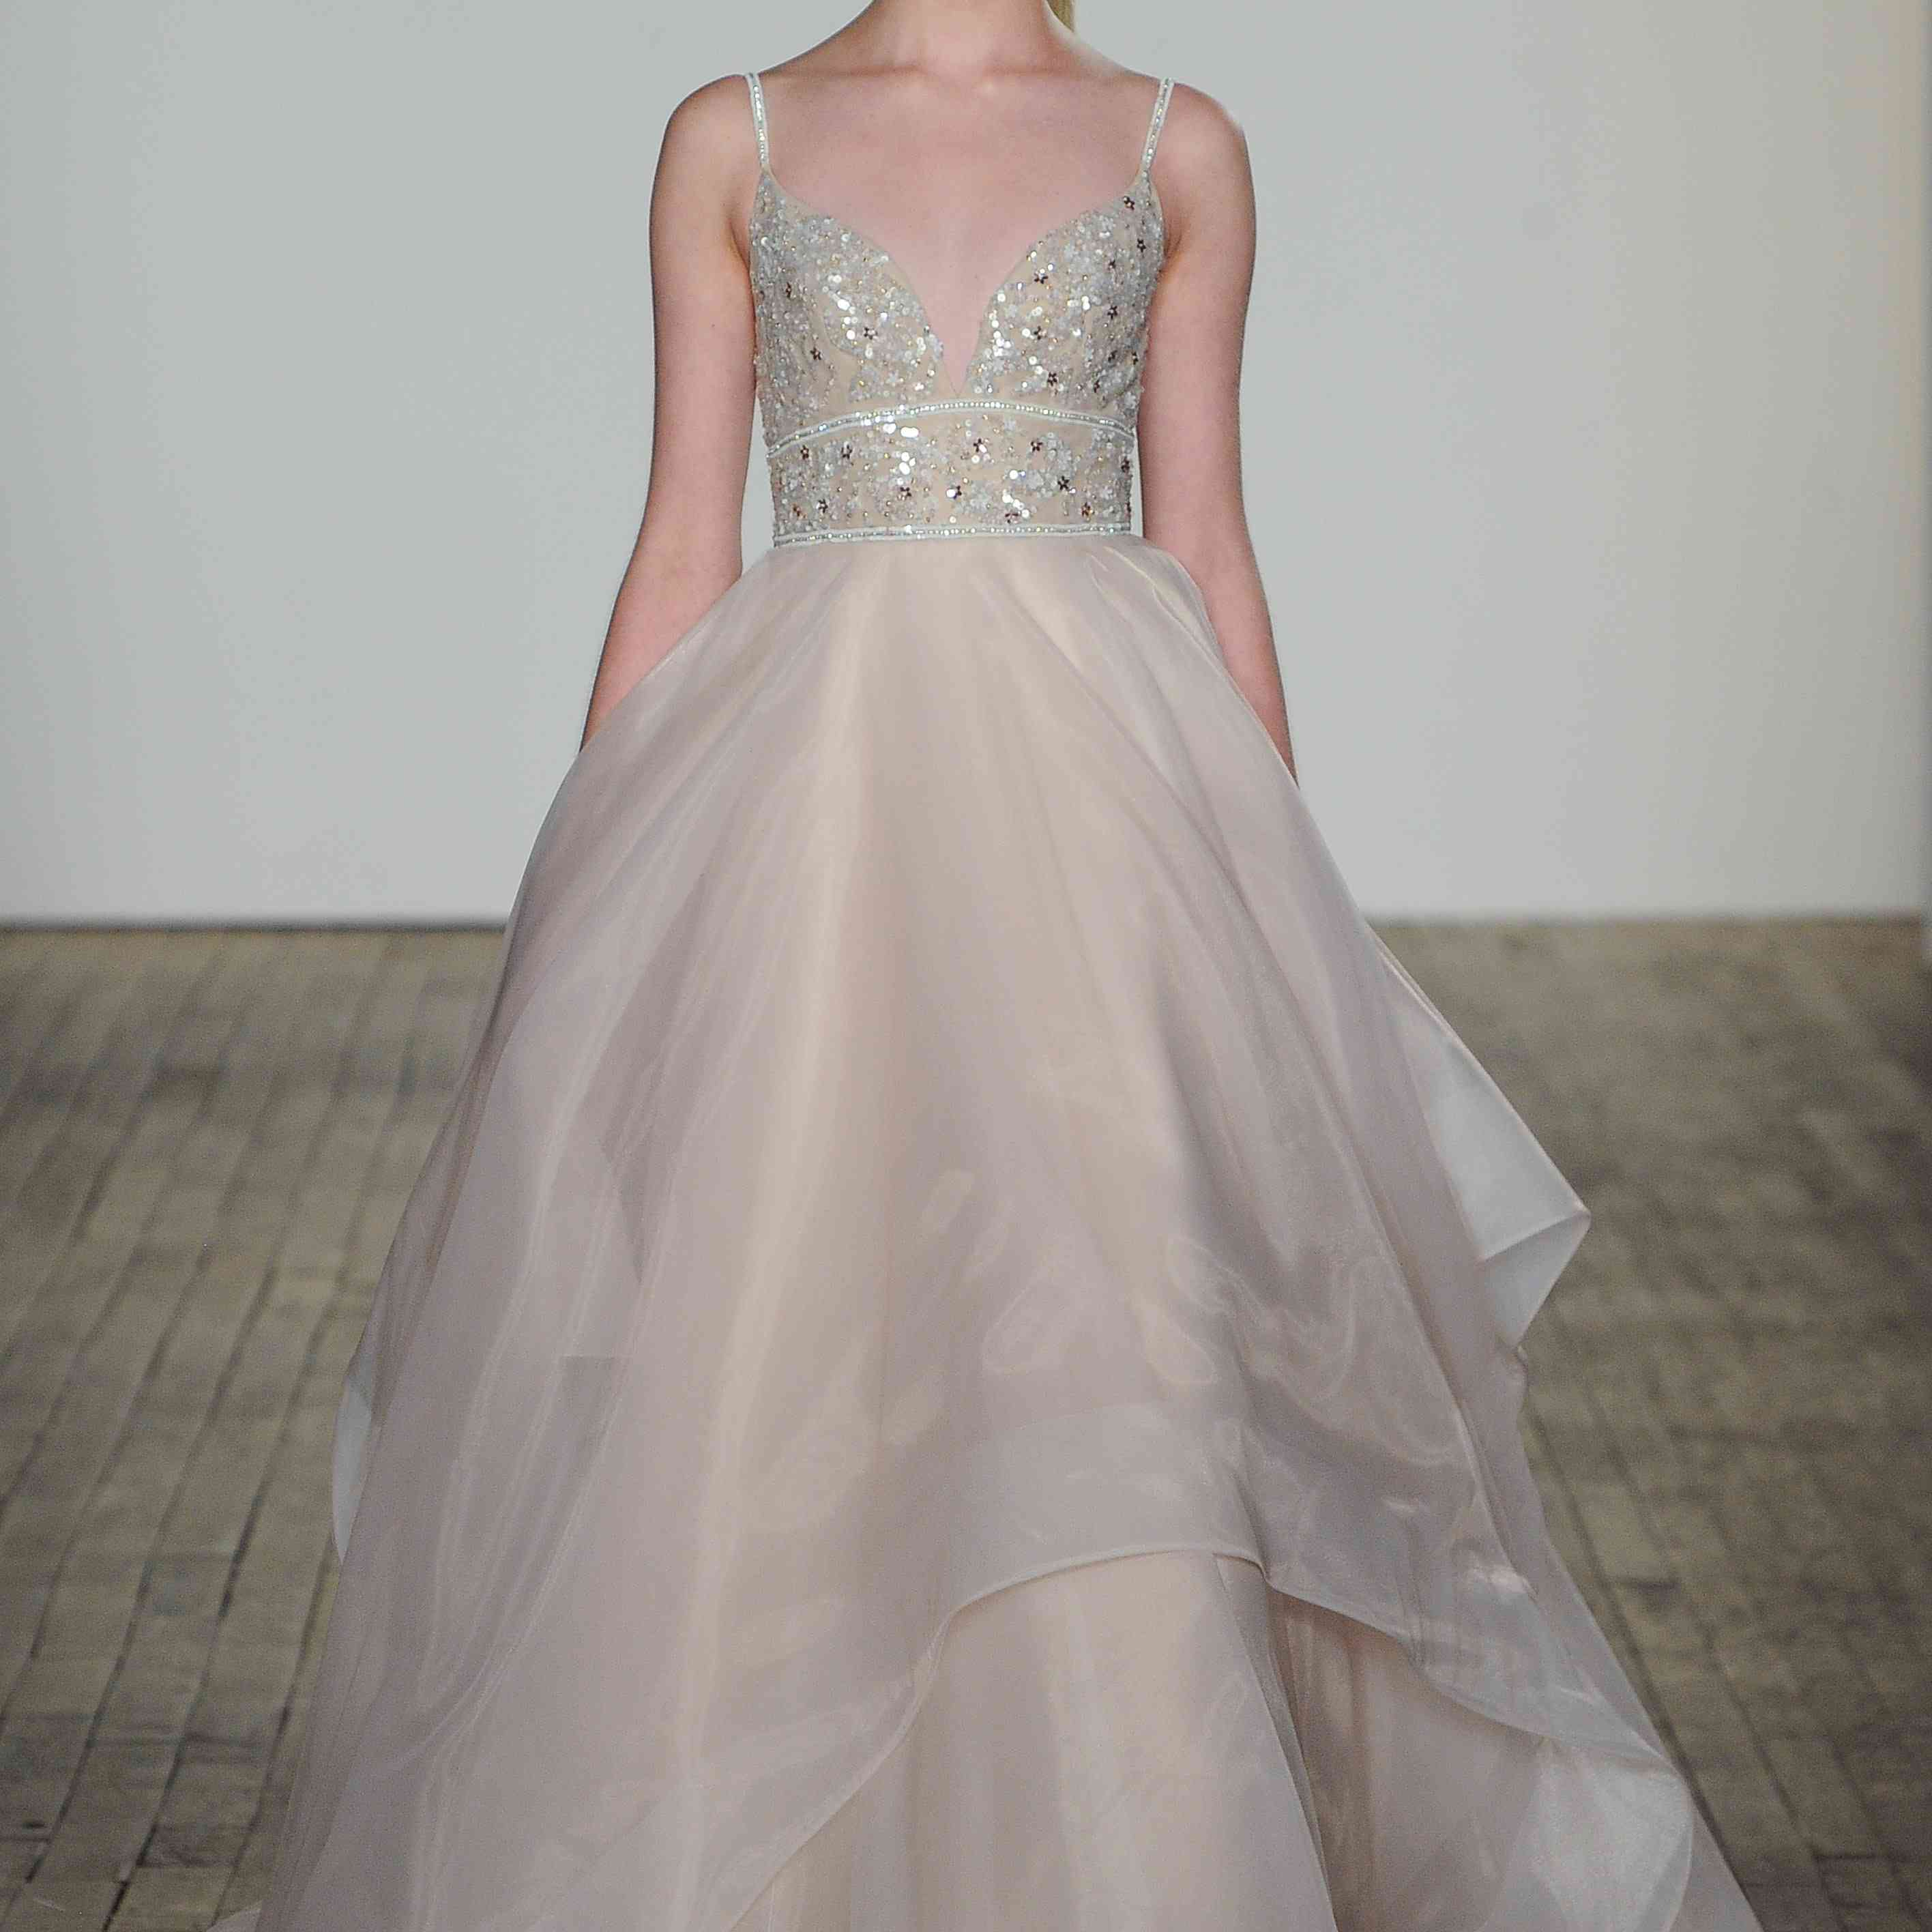 Pheonix blush sleeveless wedding gown